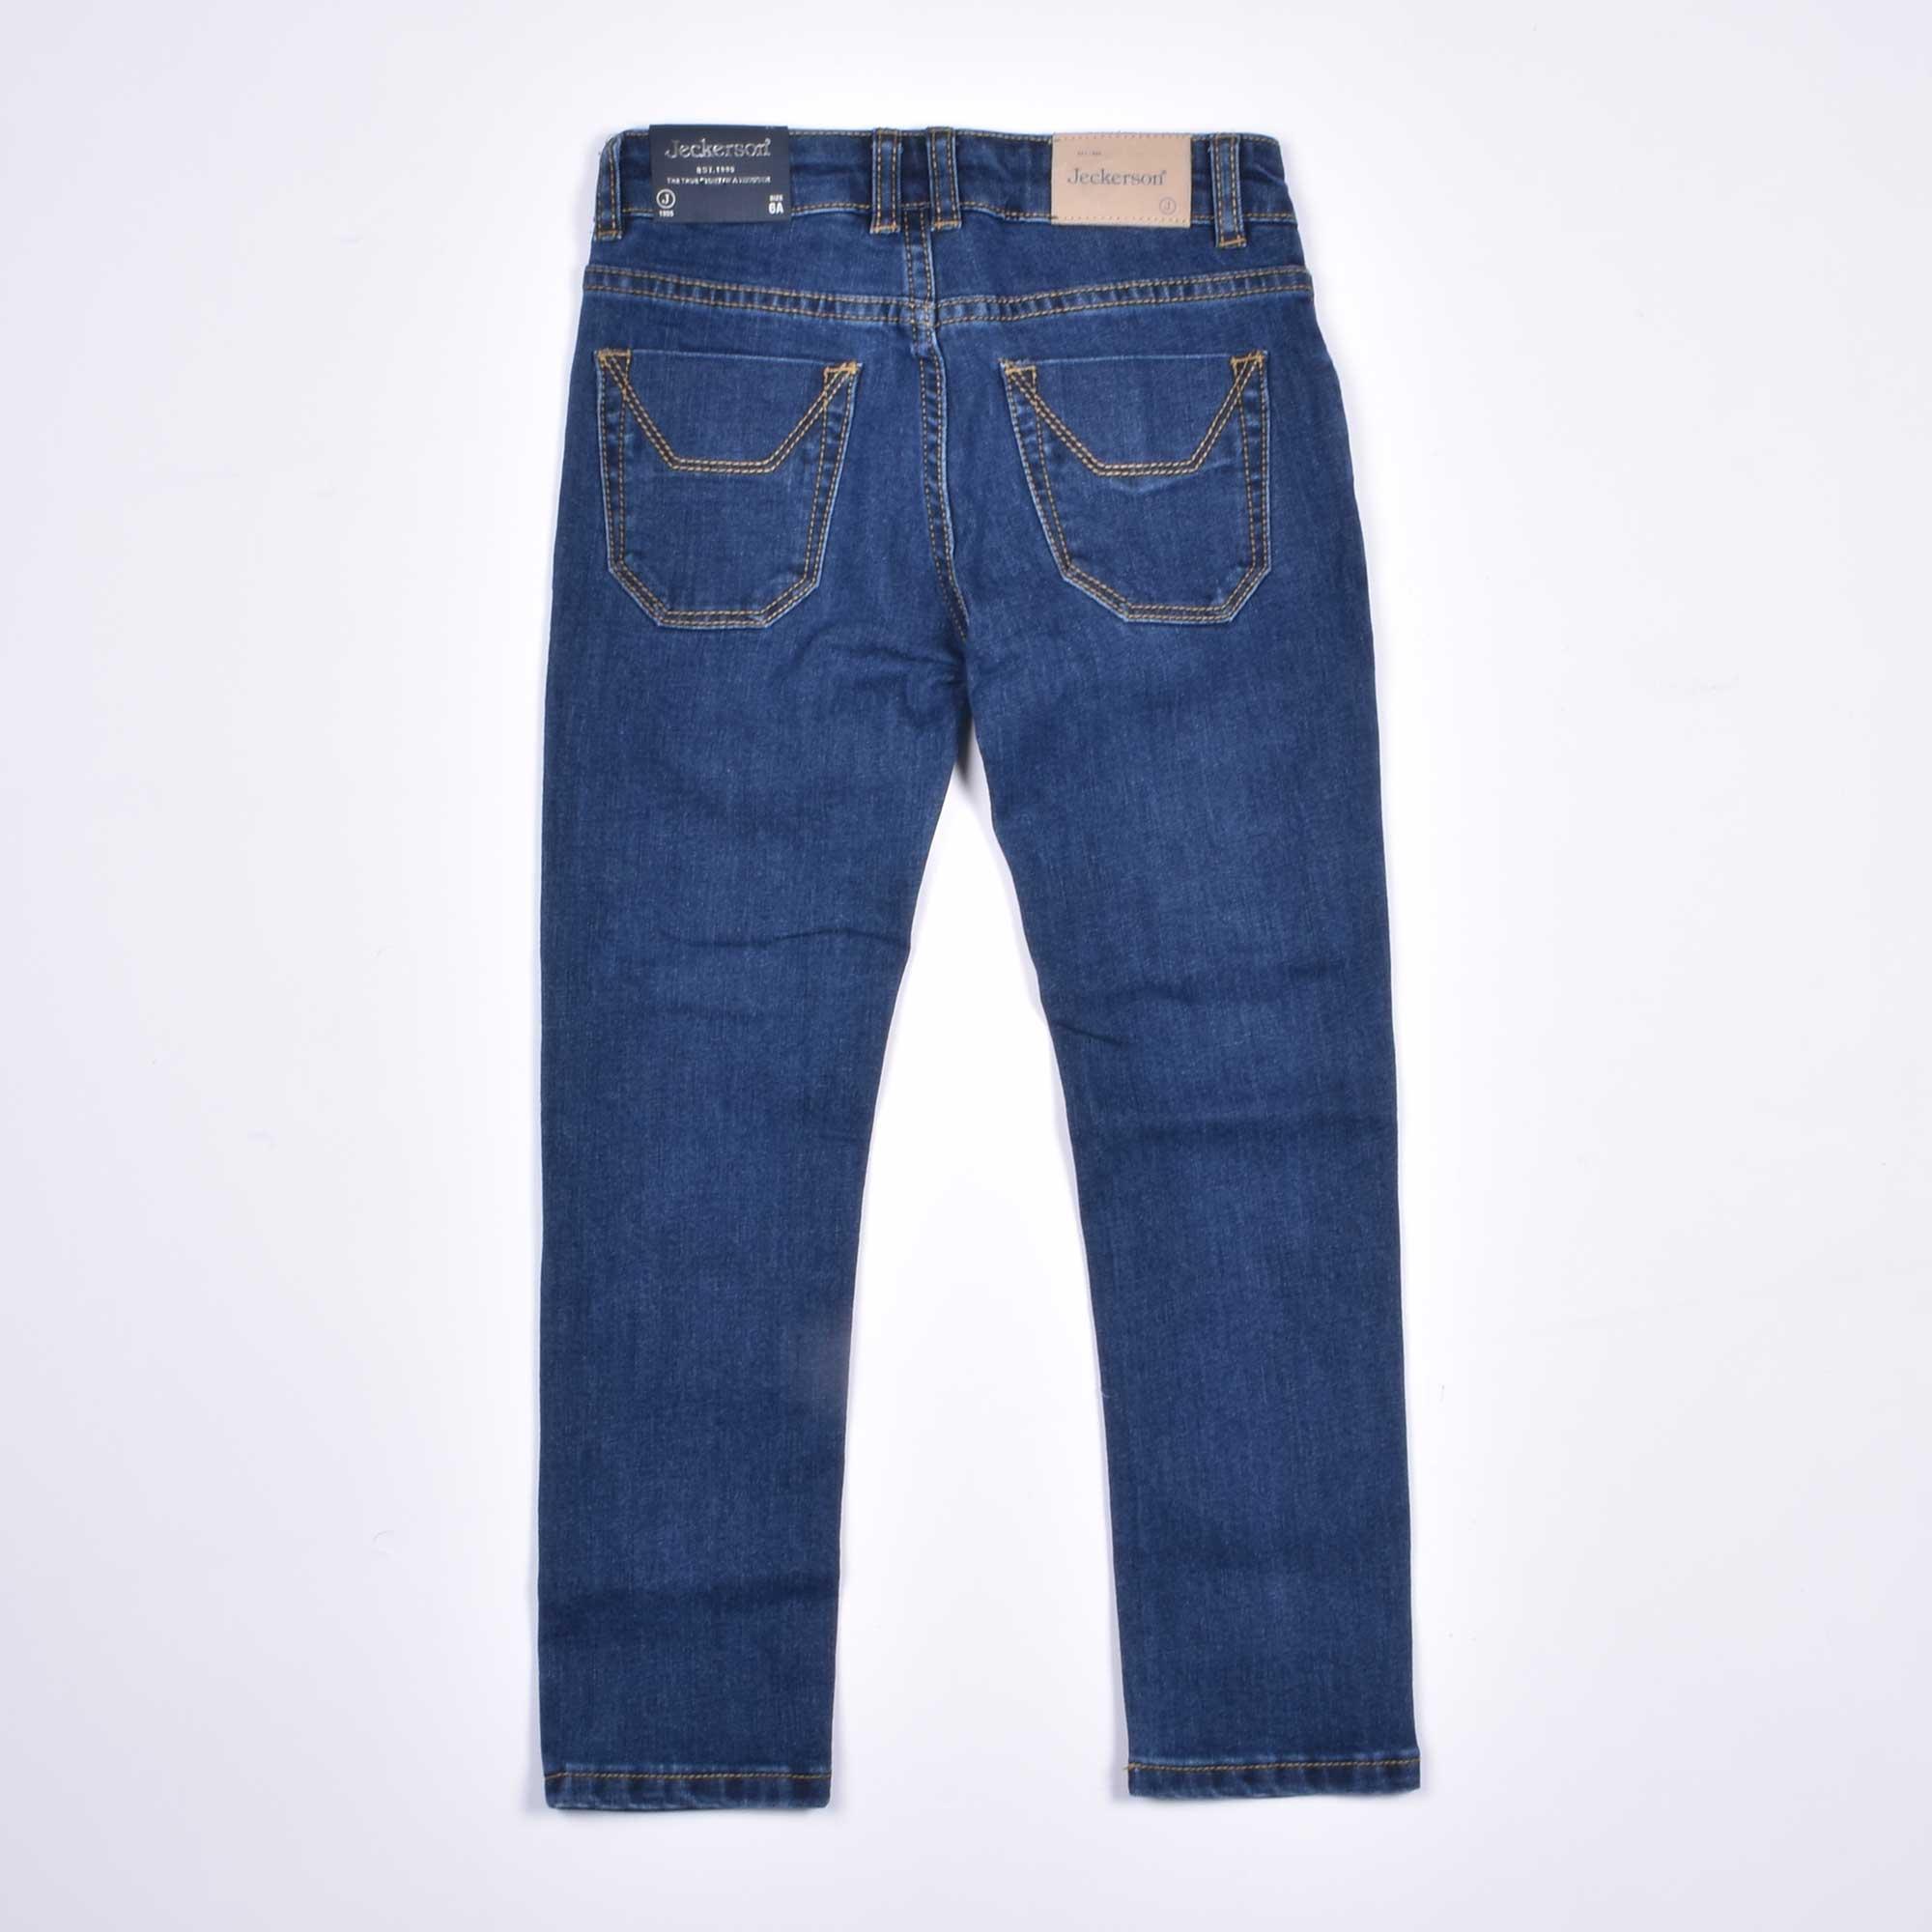 Jeans baby toppa america - Denim